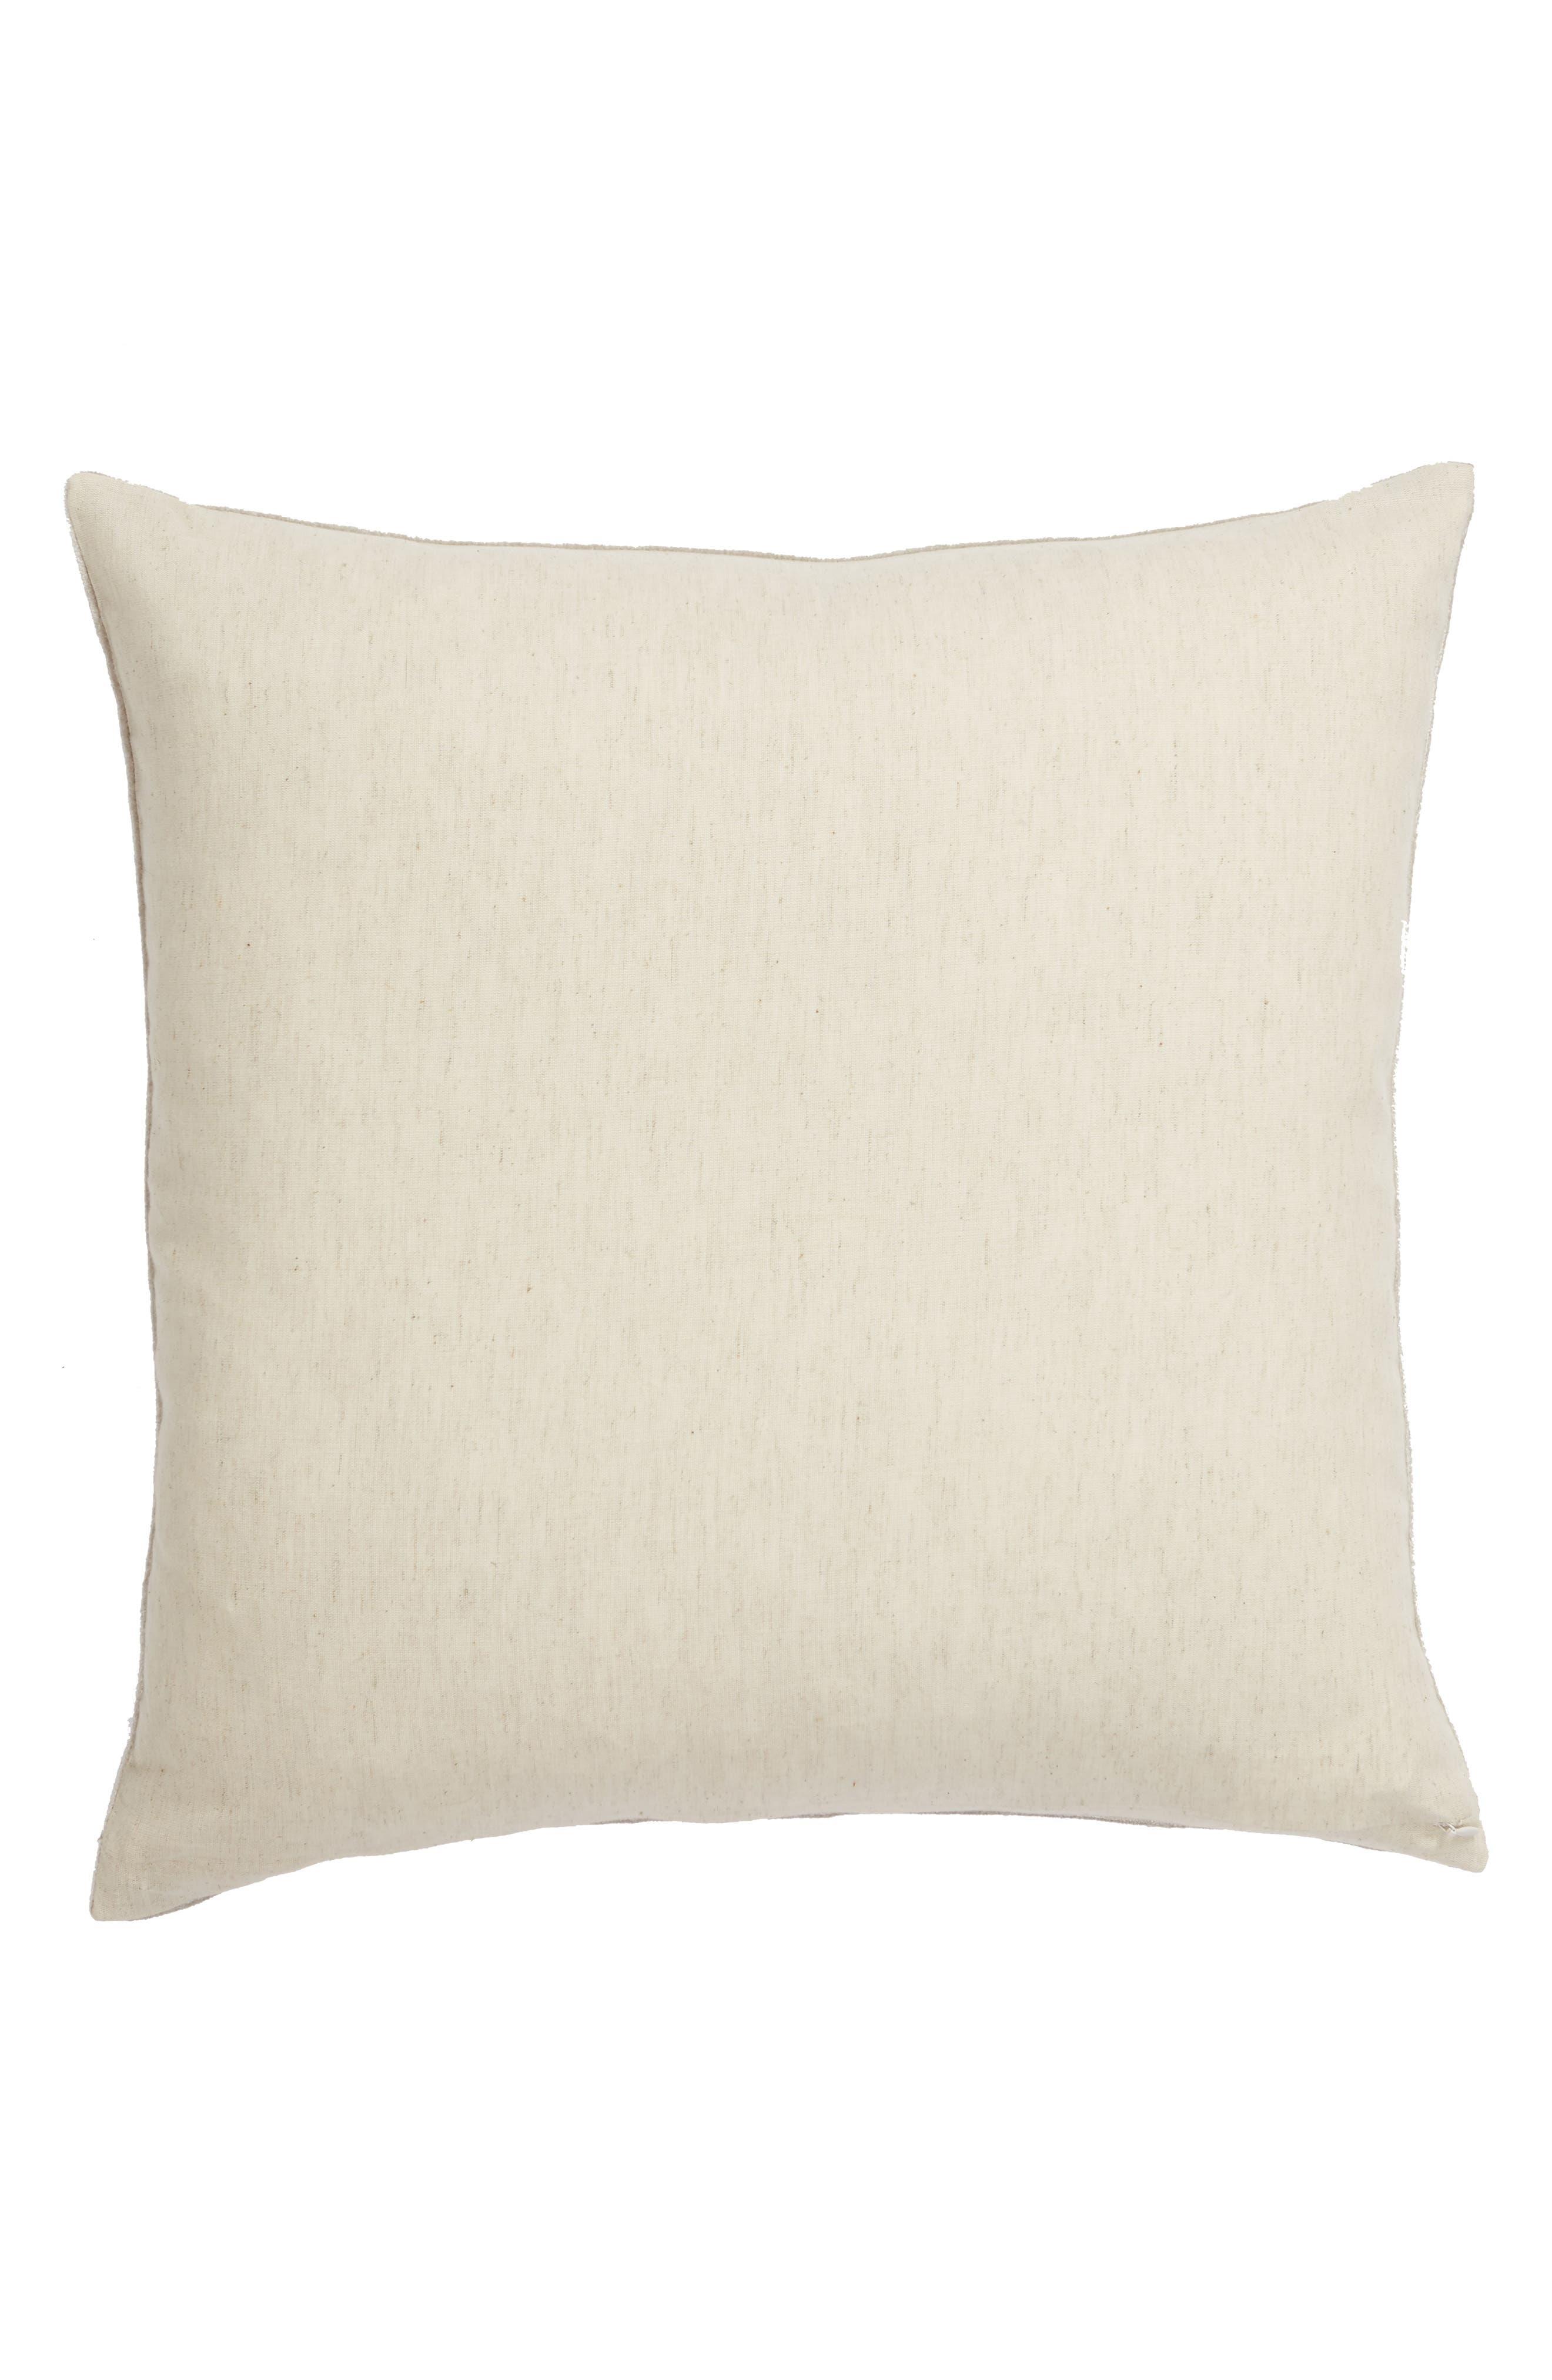 ,                             Beastie Embroidered Velvet Accent Pillow,                             Alternate thumbnail 2, color,                             020